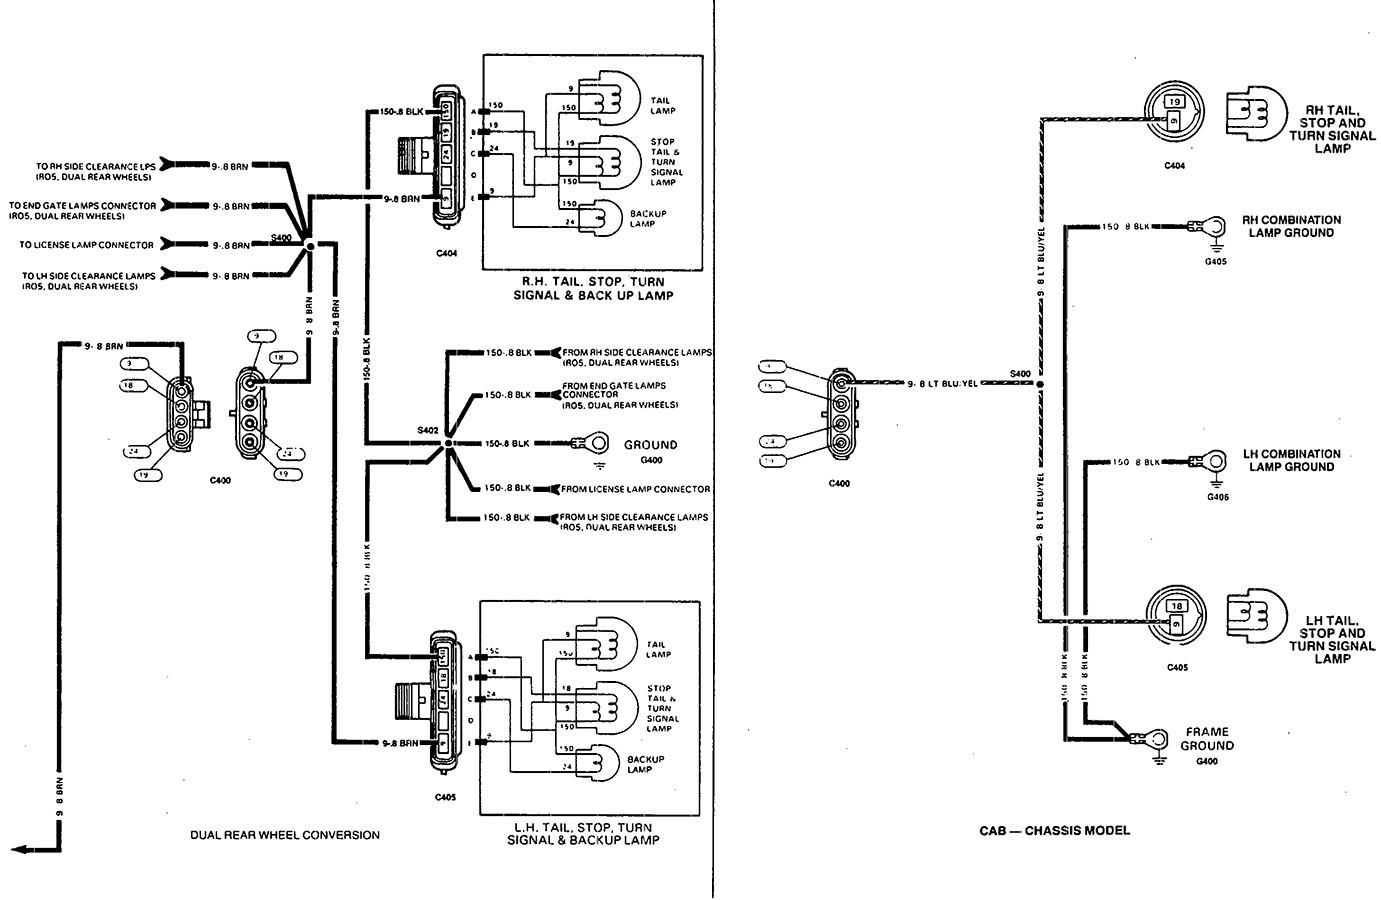 93 s10 truck wiring diagram ks 1534  93 chevy k1500 wiring diagram wiring diagram  93 chevy k1500 wiring diagram wiring